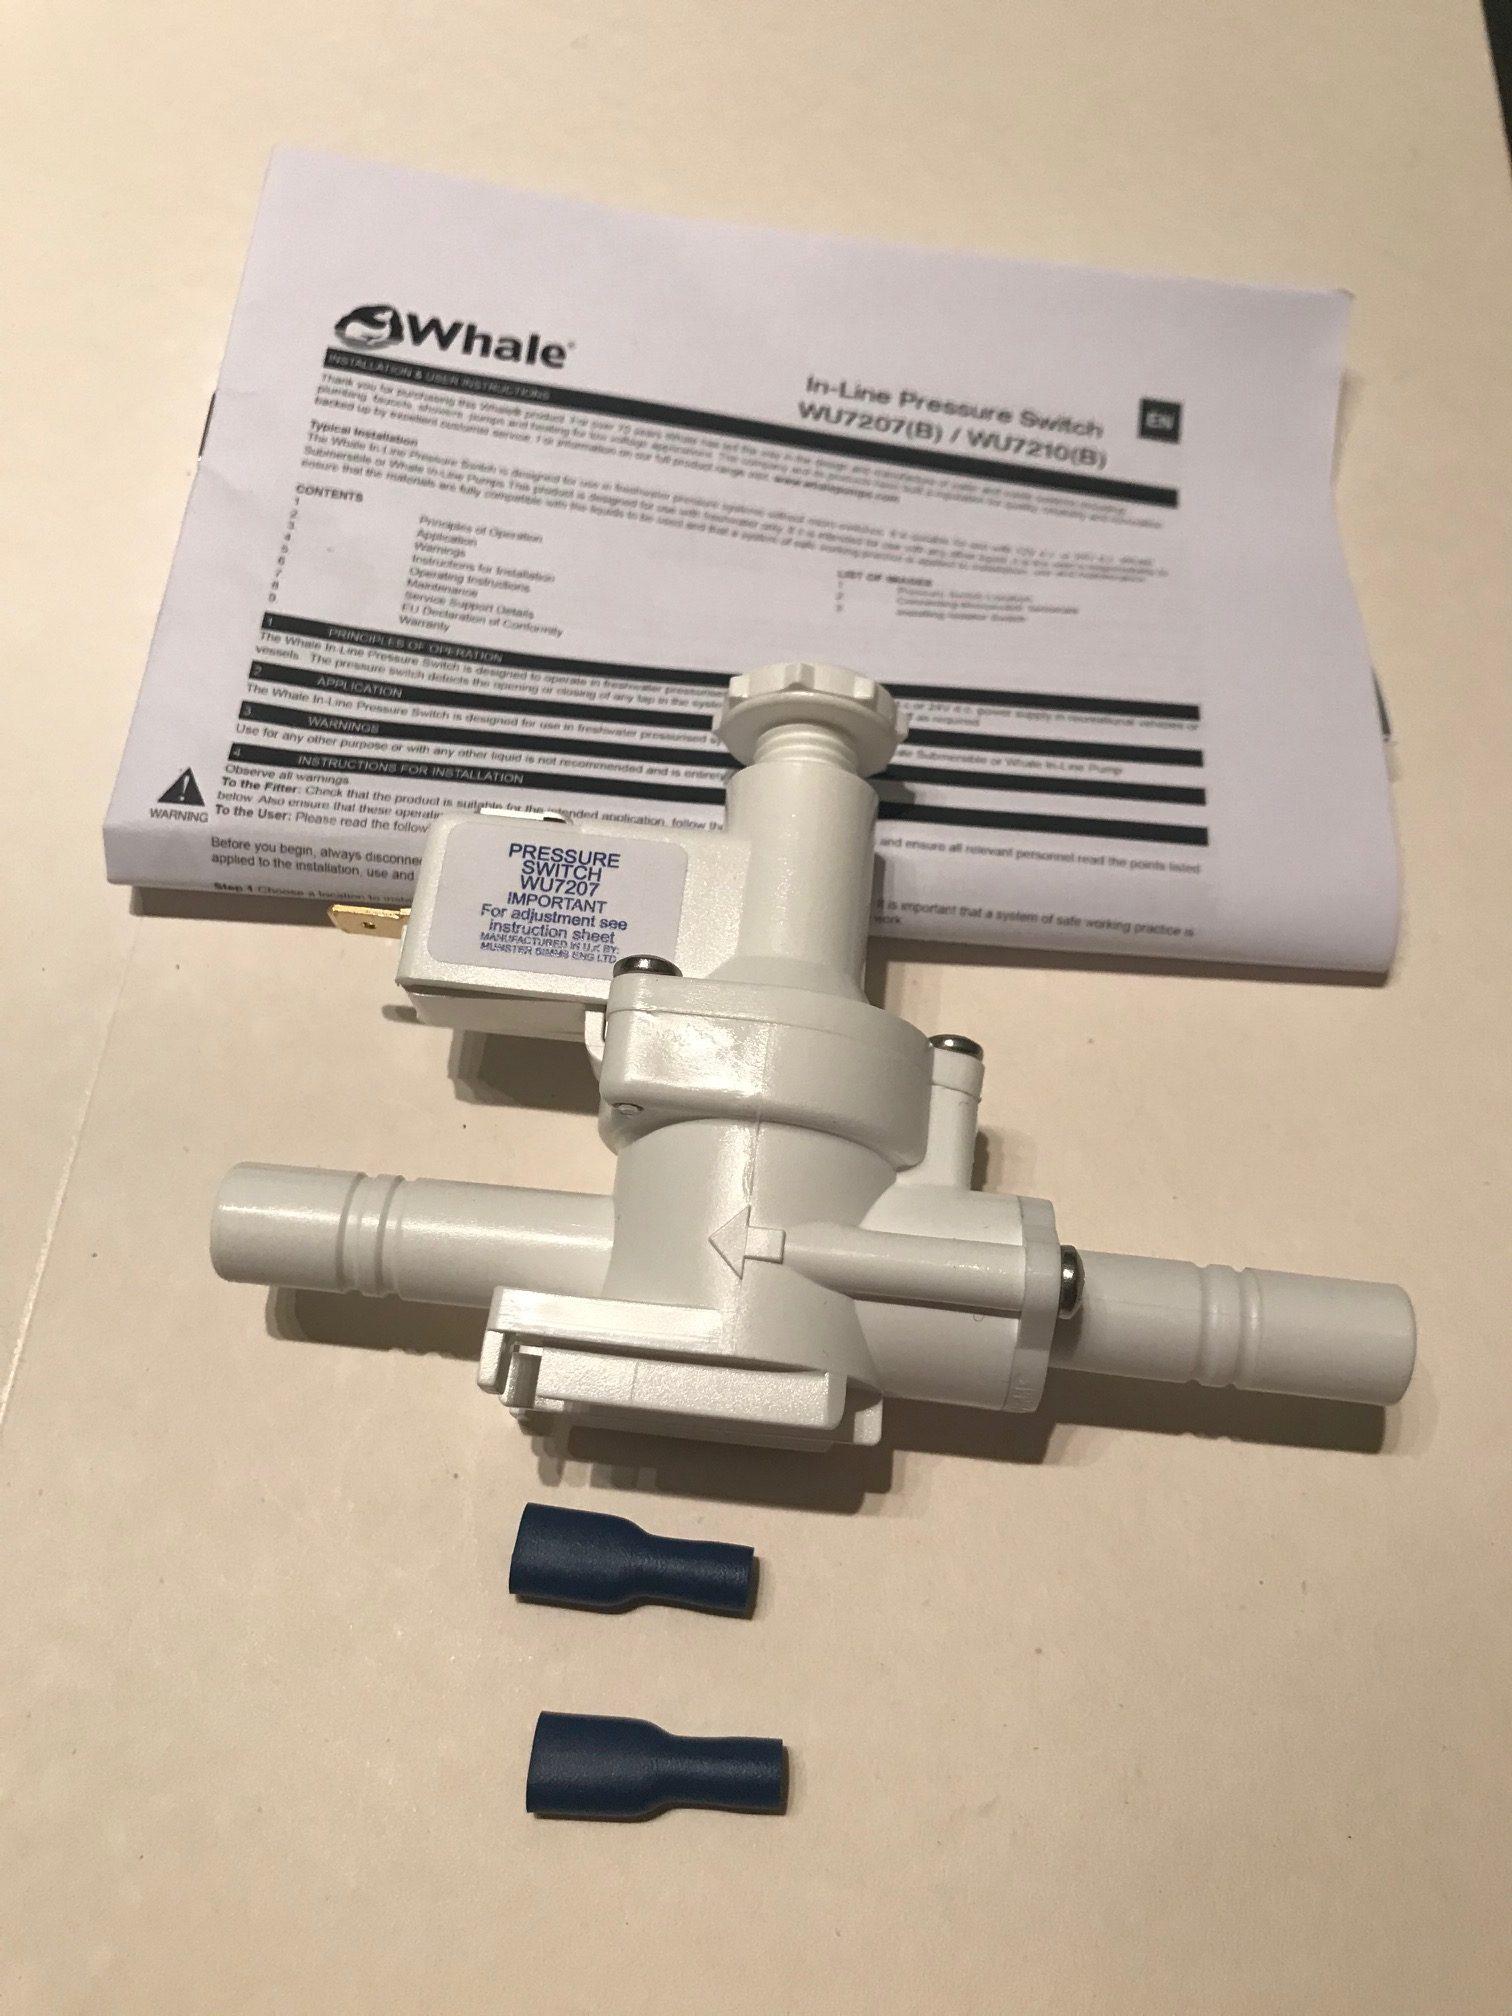 Whale Inline Pressure Switch